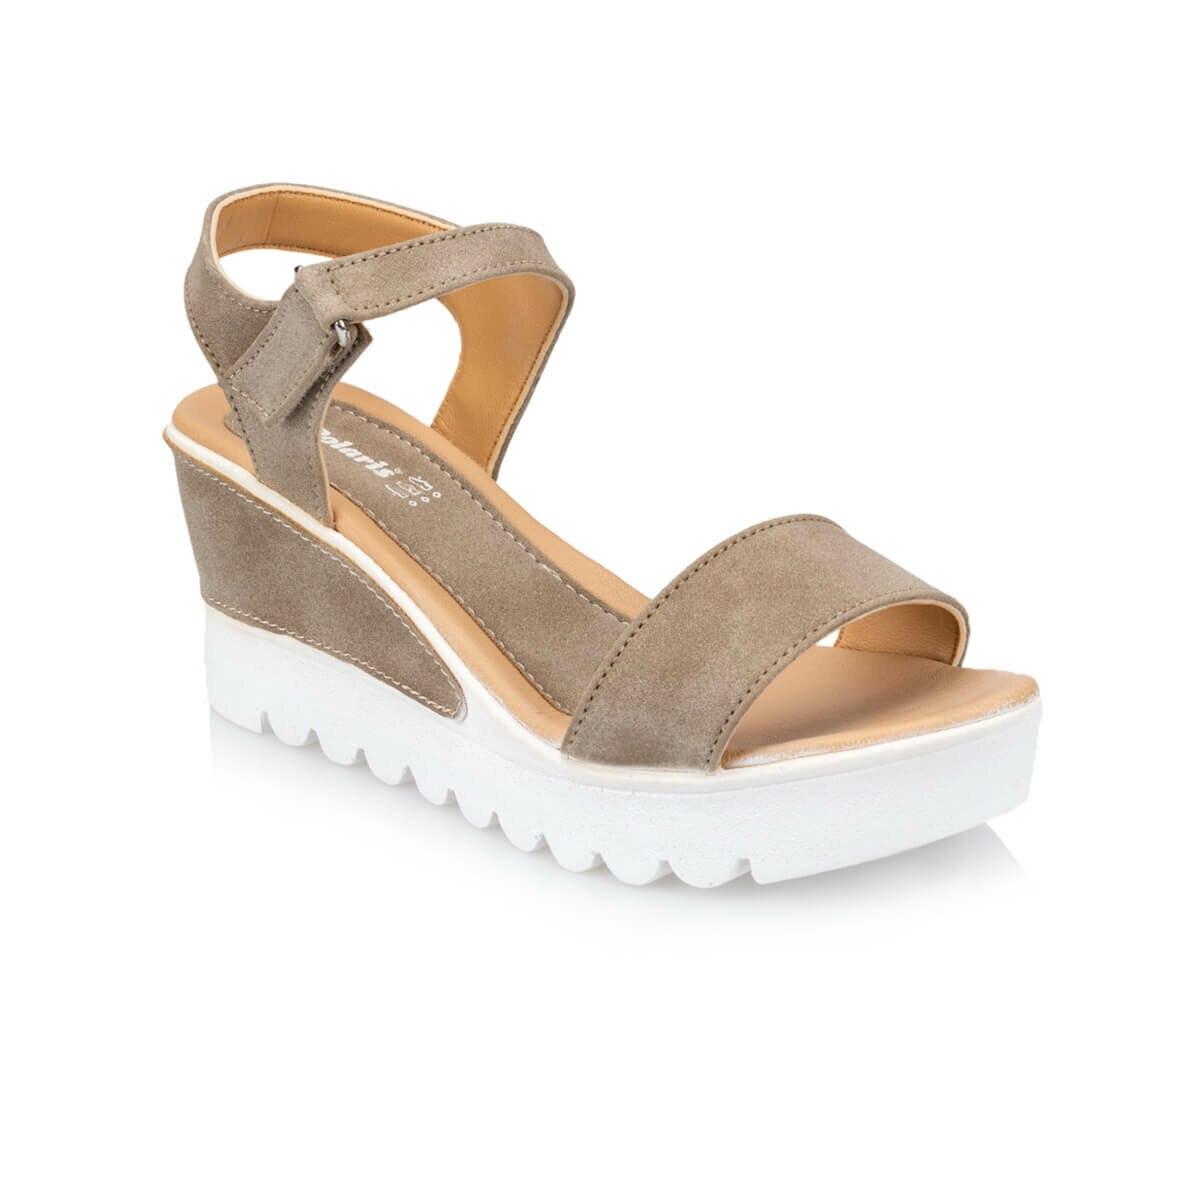 FLO 91.309983.Z Mink Women 'S Sandals Polaris